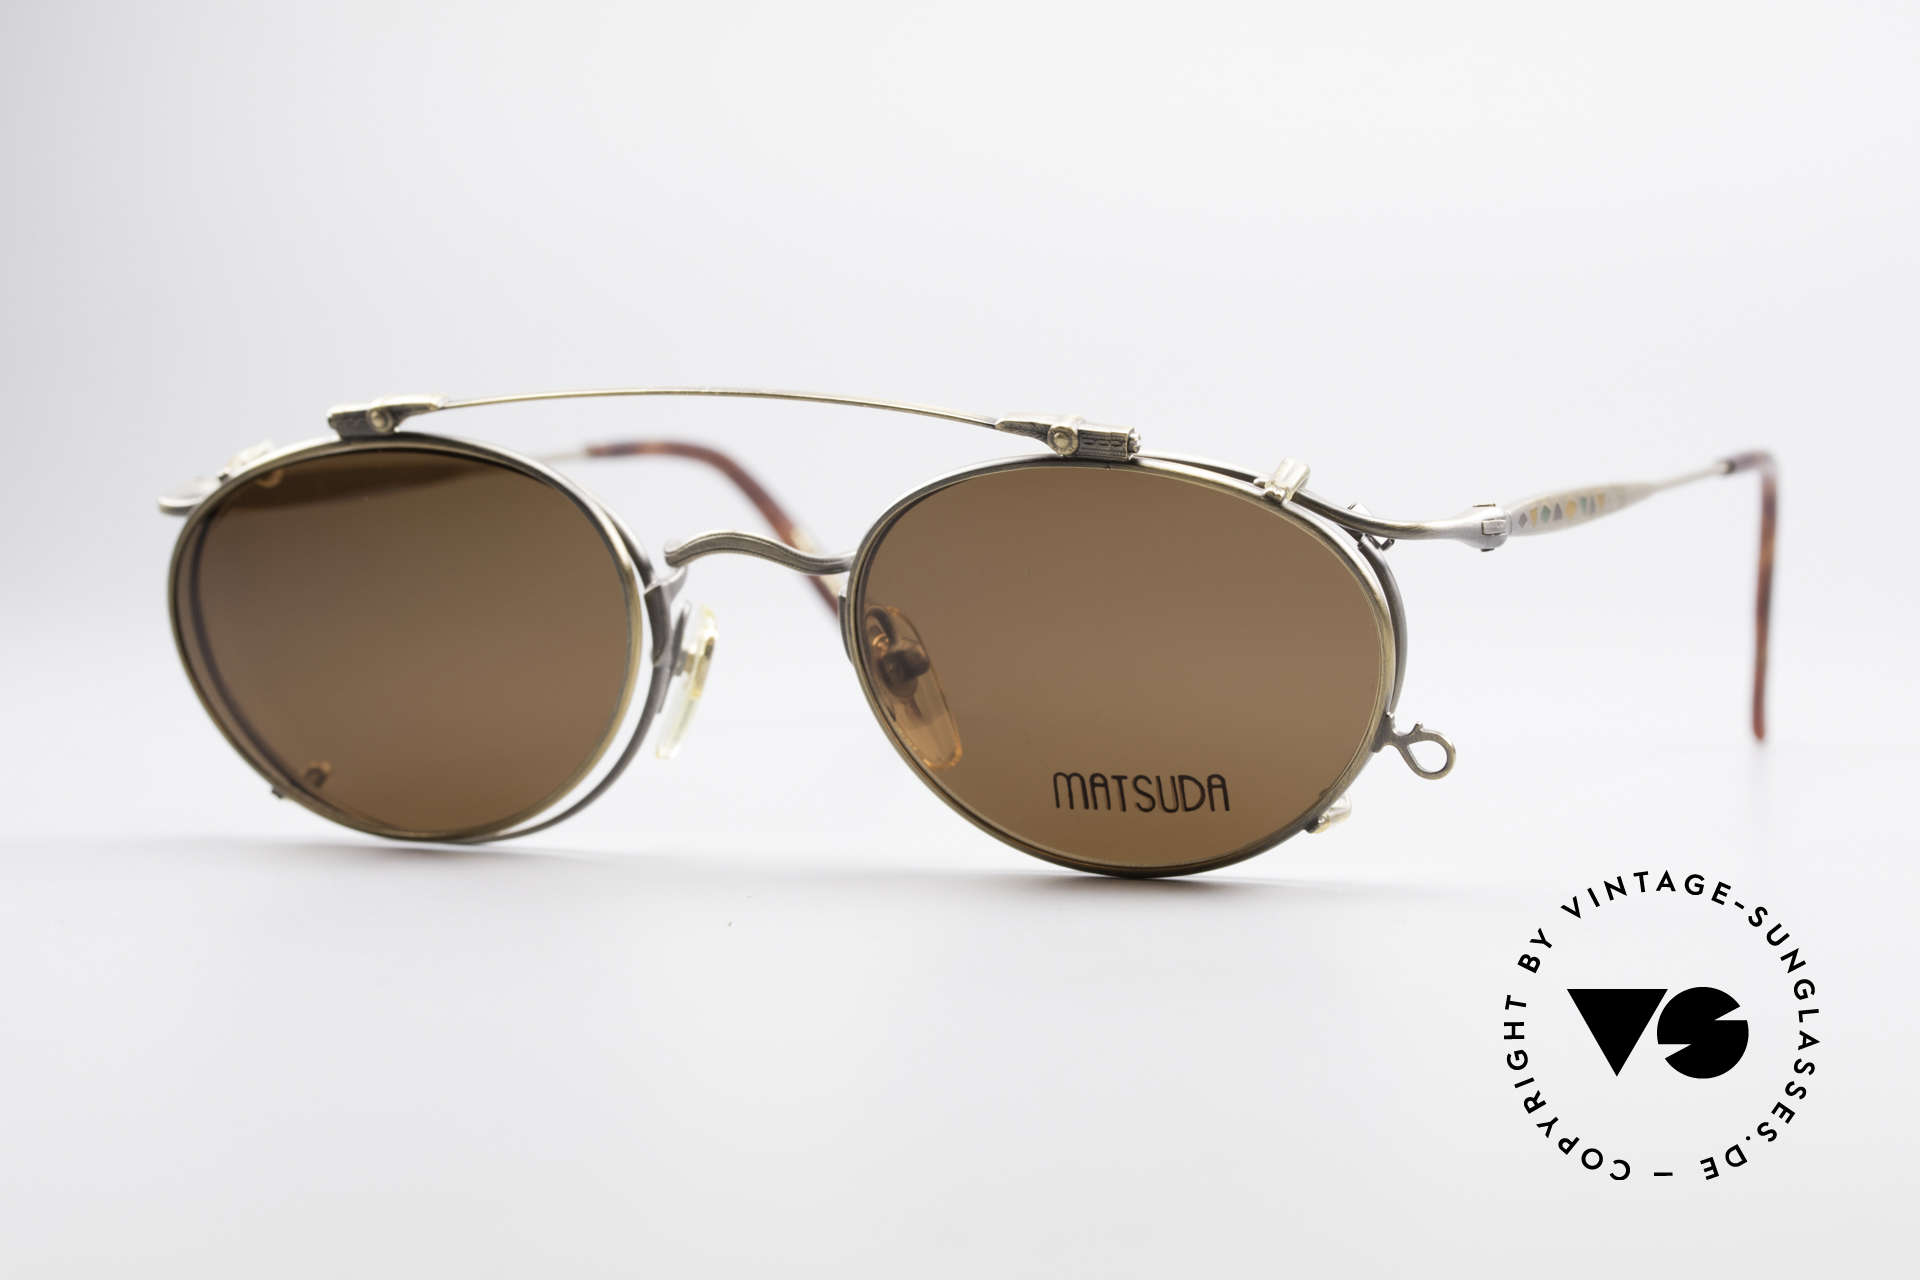 Matsuda 2853 Steampunk Vintage Shades, vintage Matsuda designer eyeglasses from the mid 90's, Made for Men